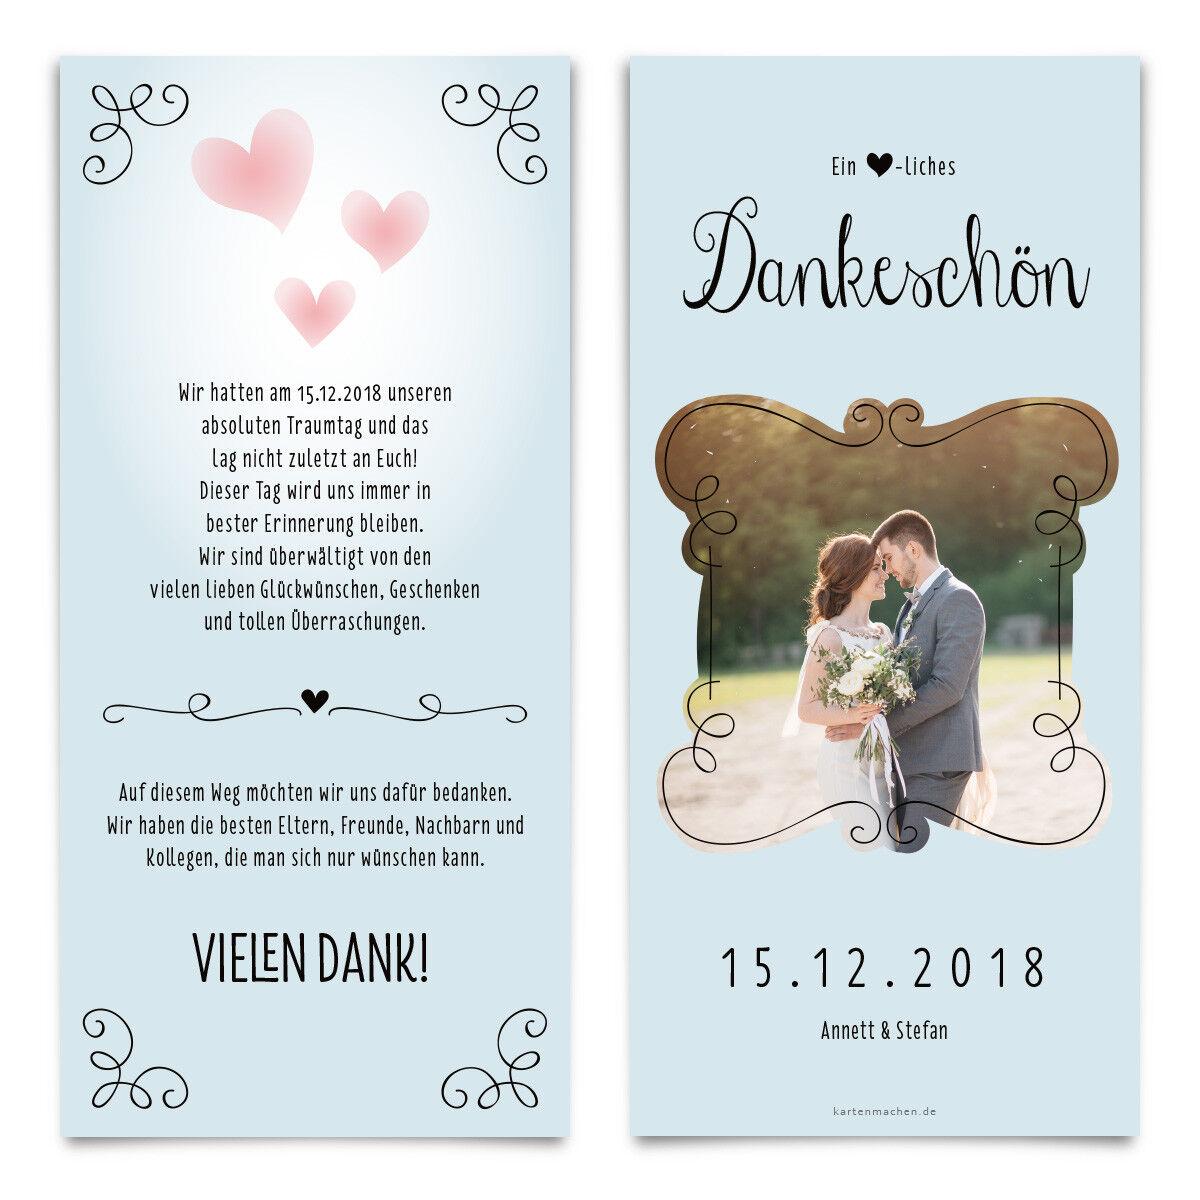 Hochzeit Dankeskarten Danksagung Danksagungskarten Danke Karte - Küssendes Paar